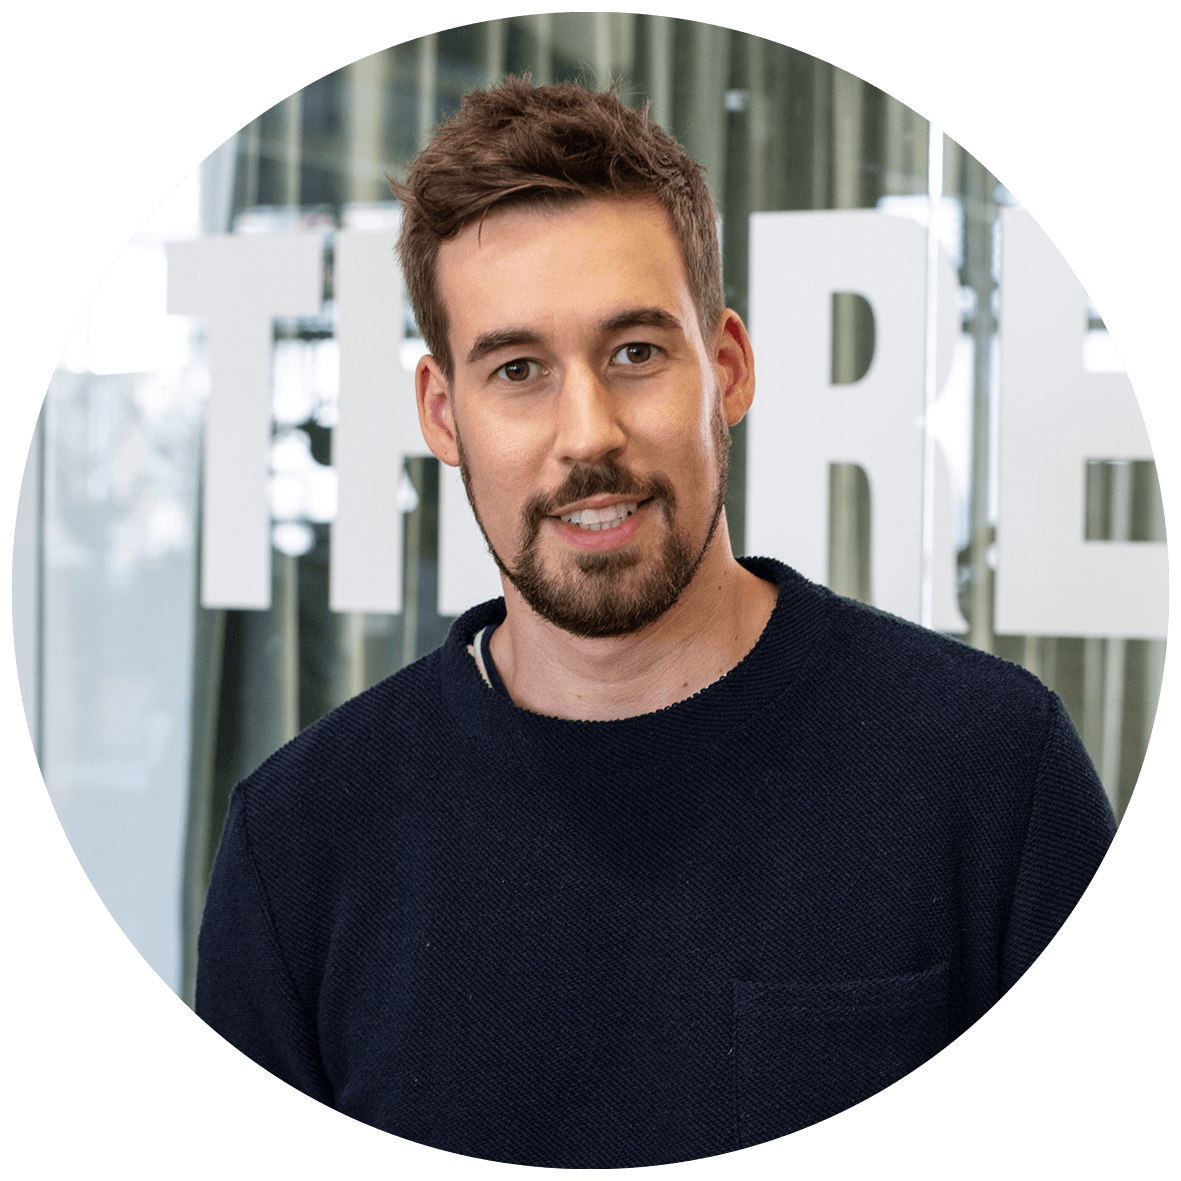 Philip Papendieck <div>INTERMATE Media GmbH</div>